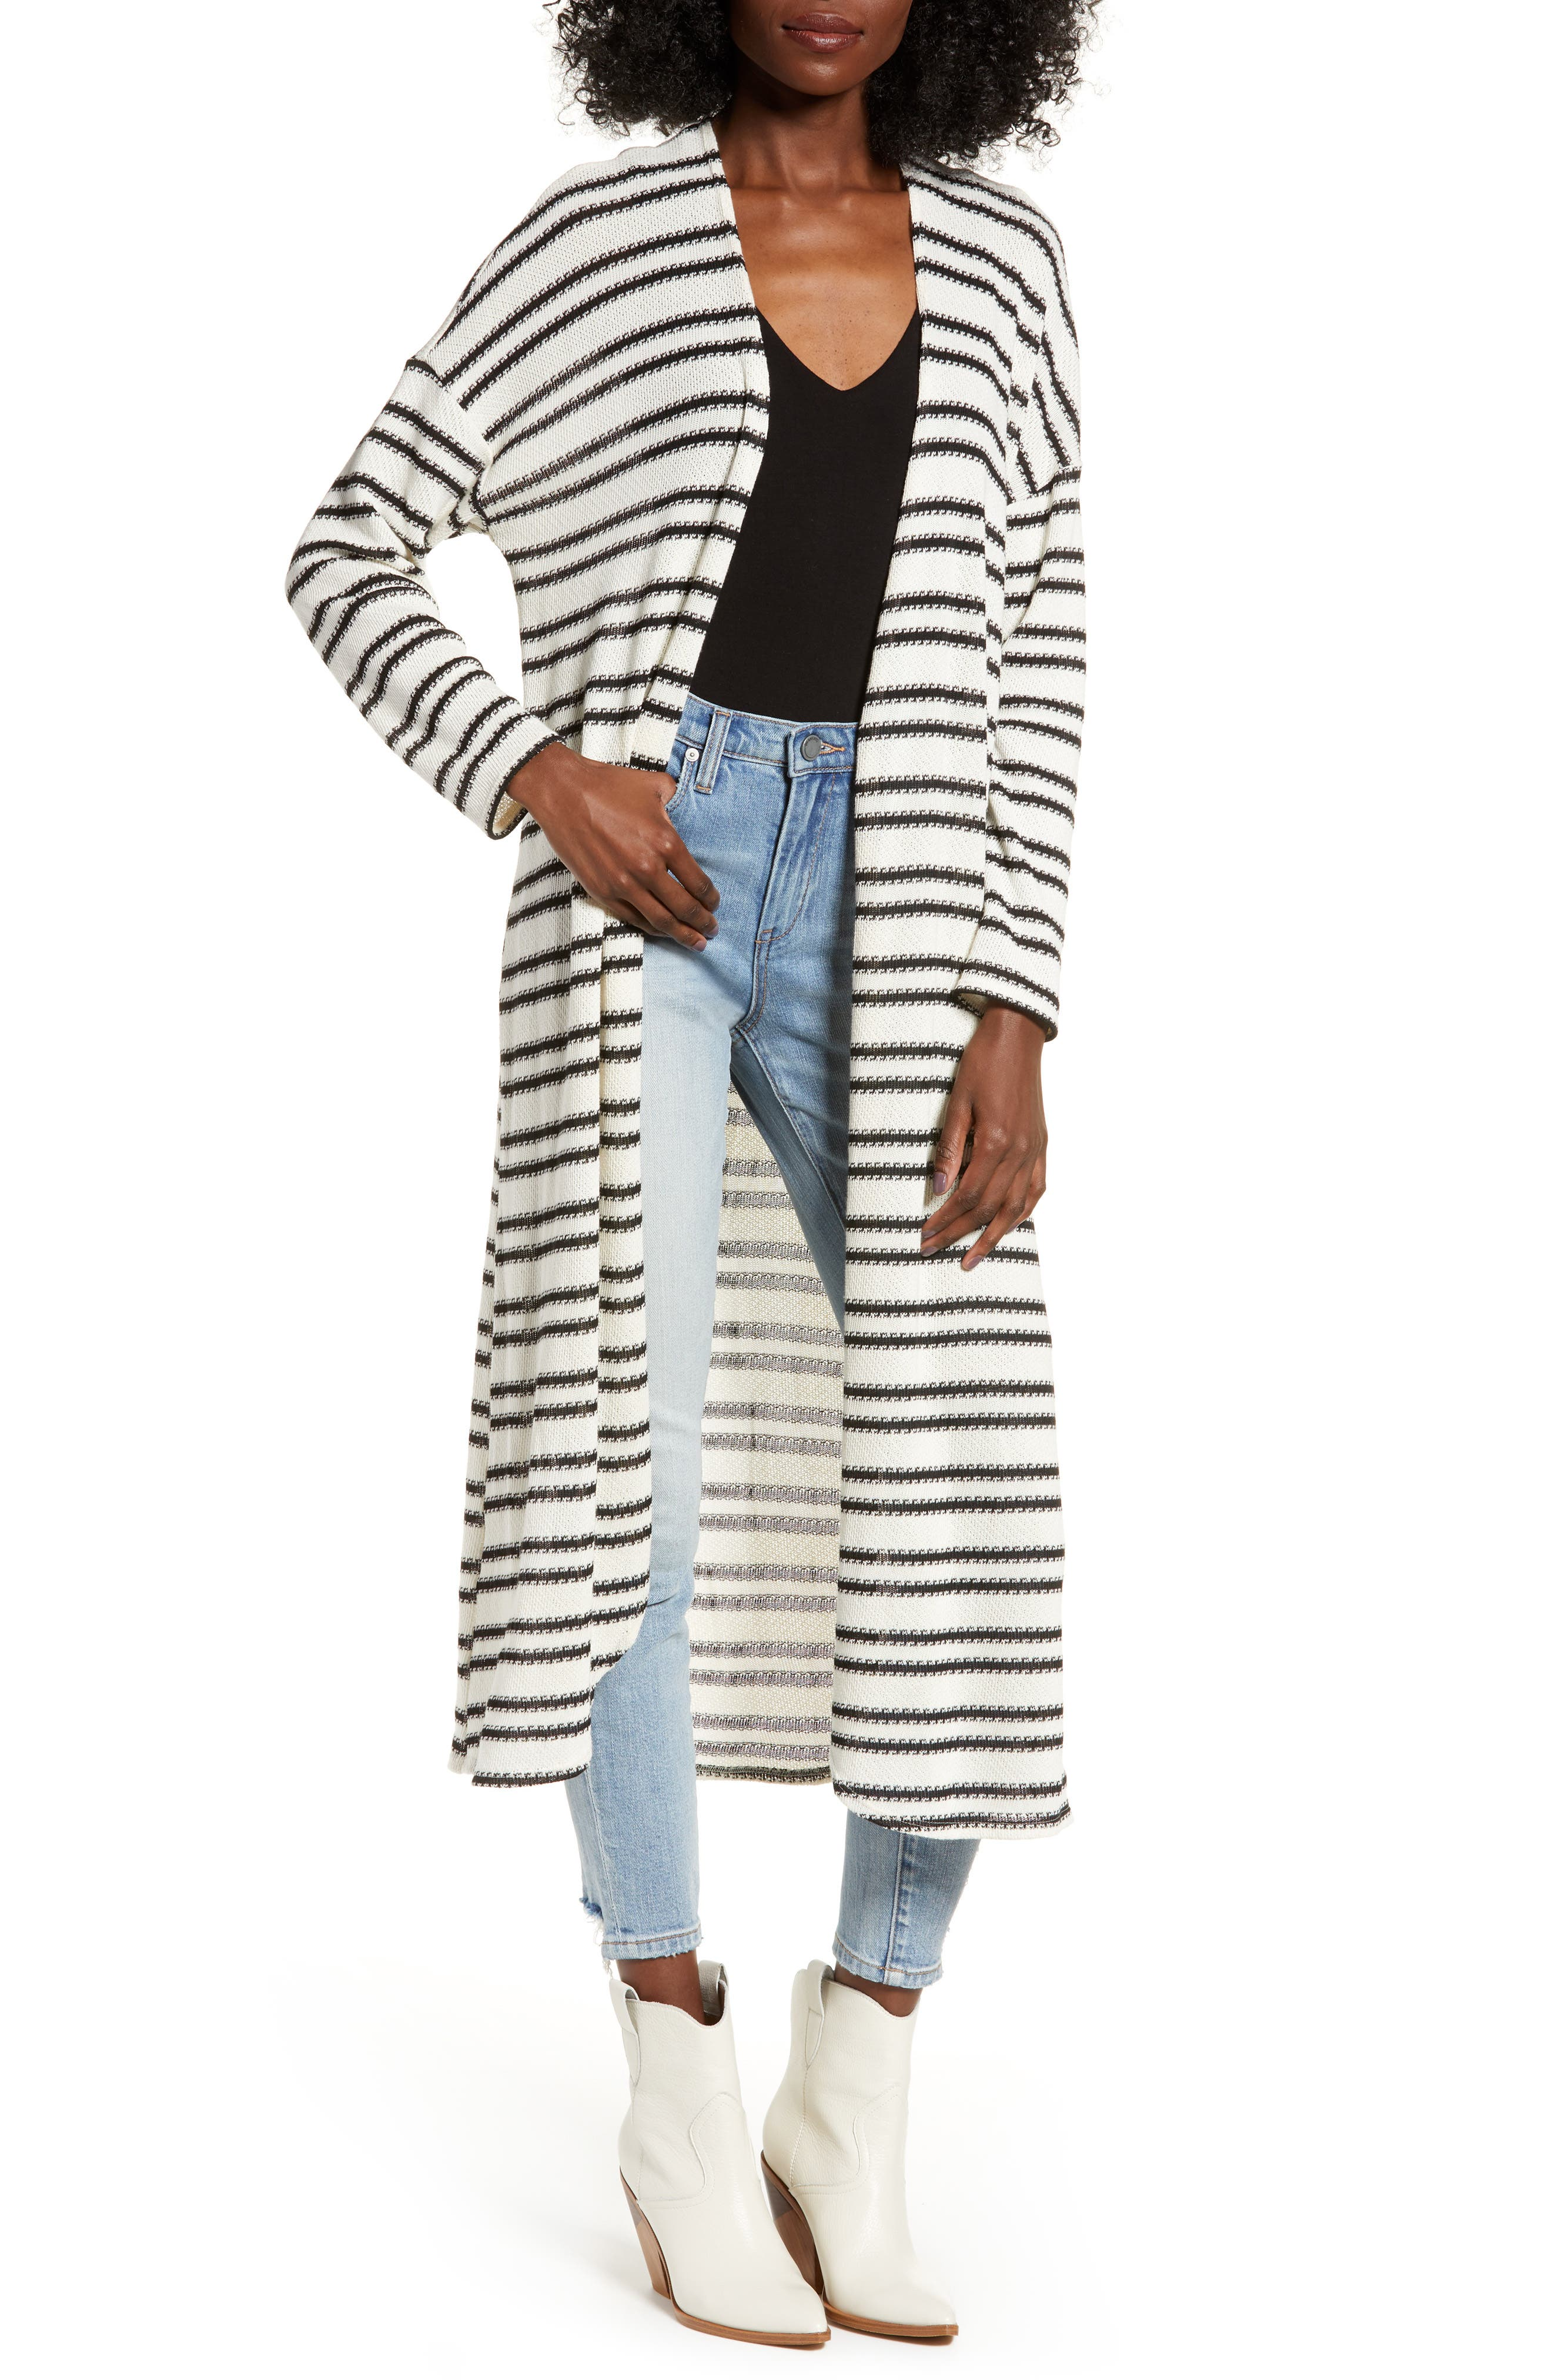 ALL IN FAVOR Stripe Longline Cardigan, Main, color, IVORY/ BLACK STRIPE